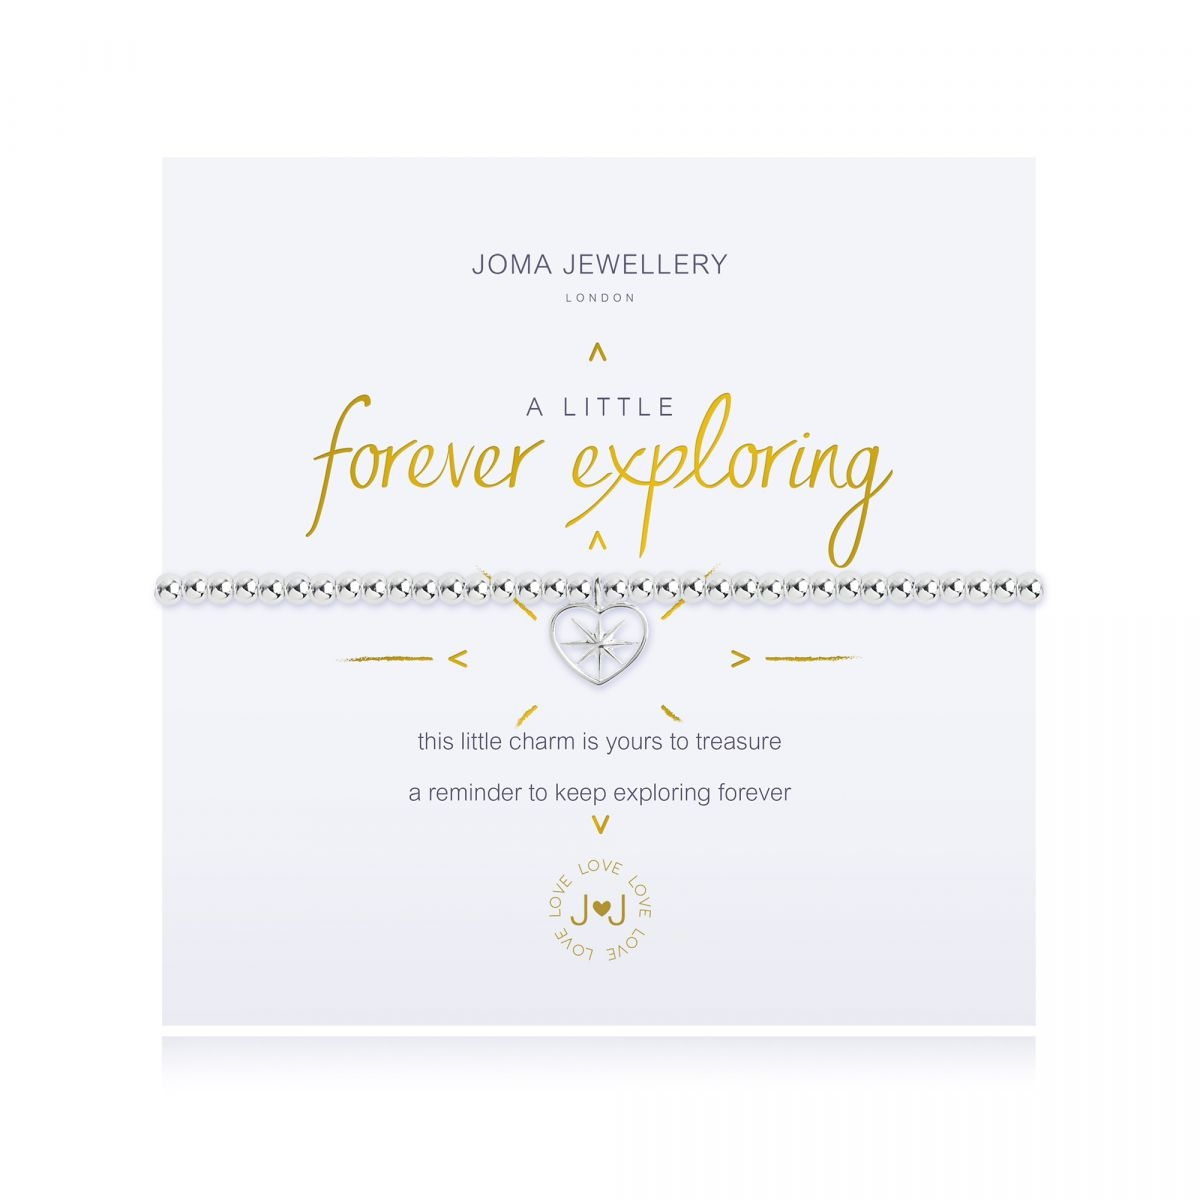 Joma Jewellery A Little 'Forever Exploring' Bracelet